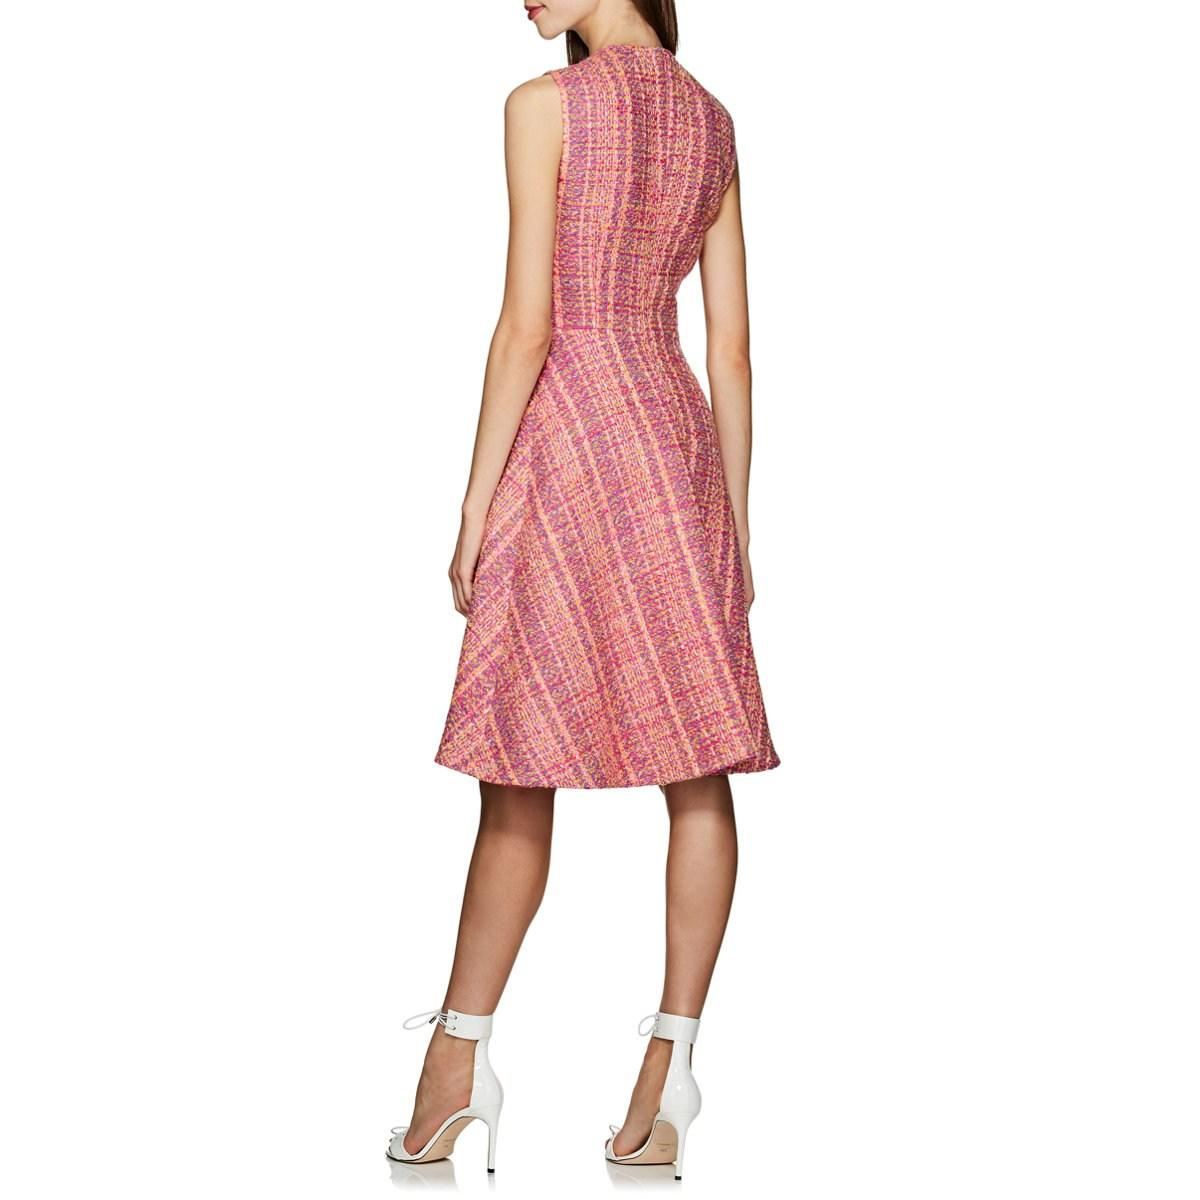 94c88295 Prada Wool Bouclé Tweed Sheath Dress in Pink - Lyst